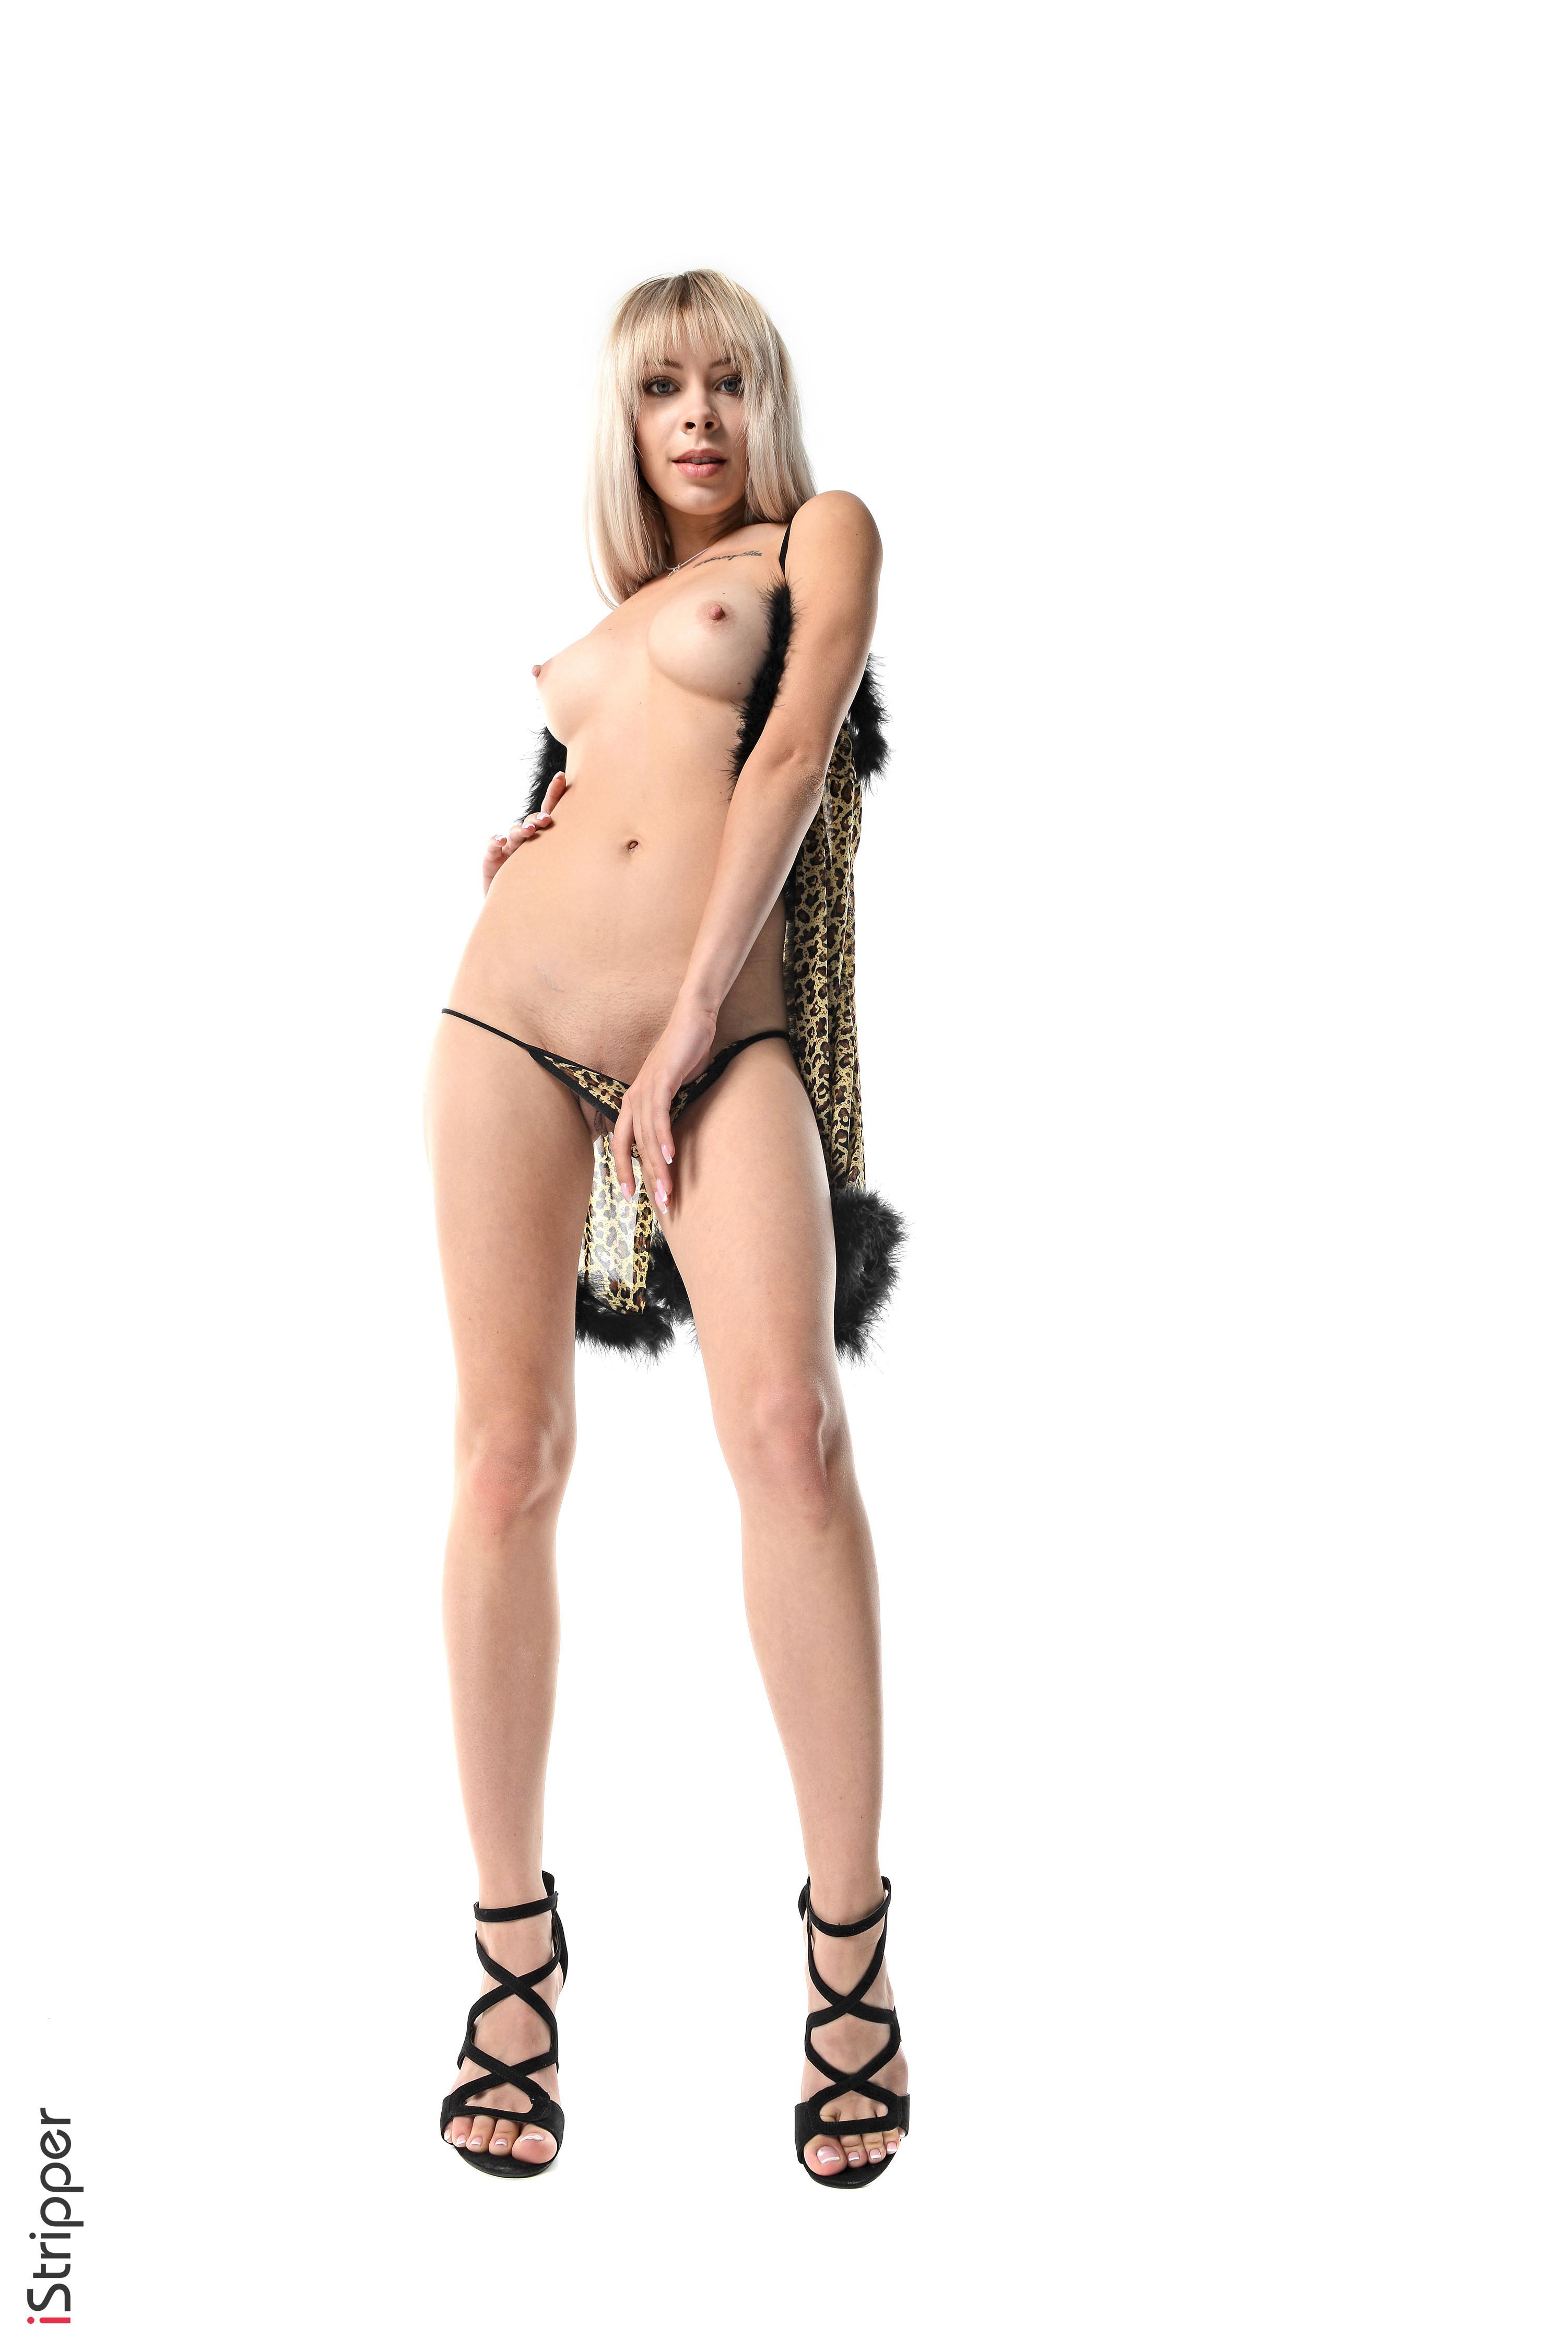 girls stripping on webcam